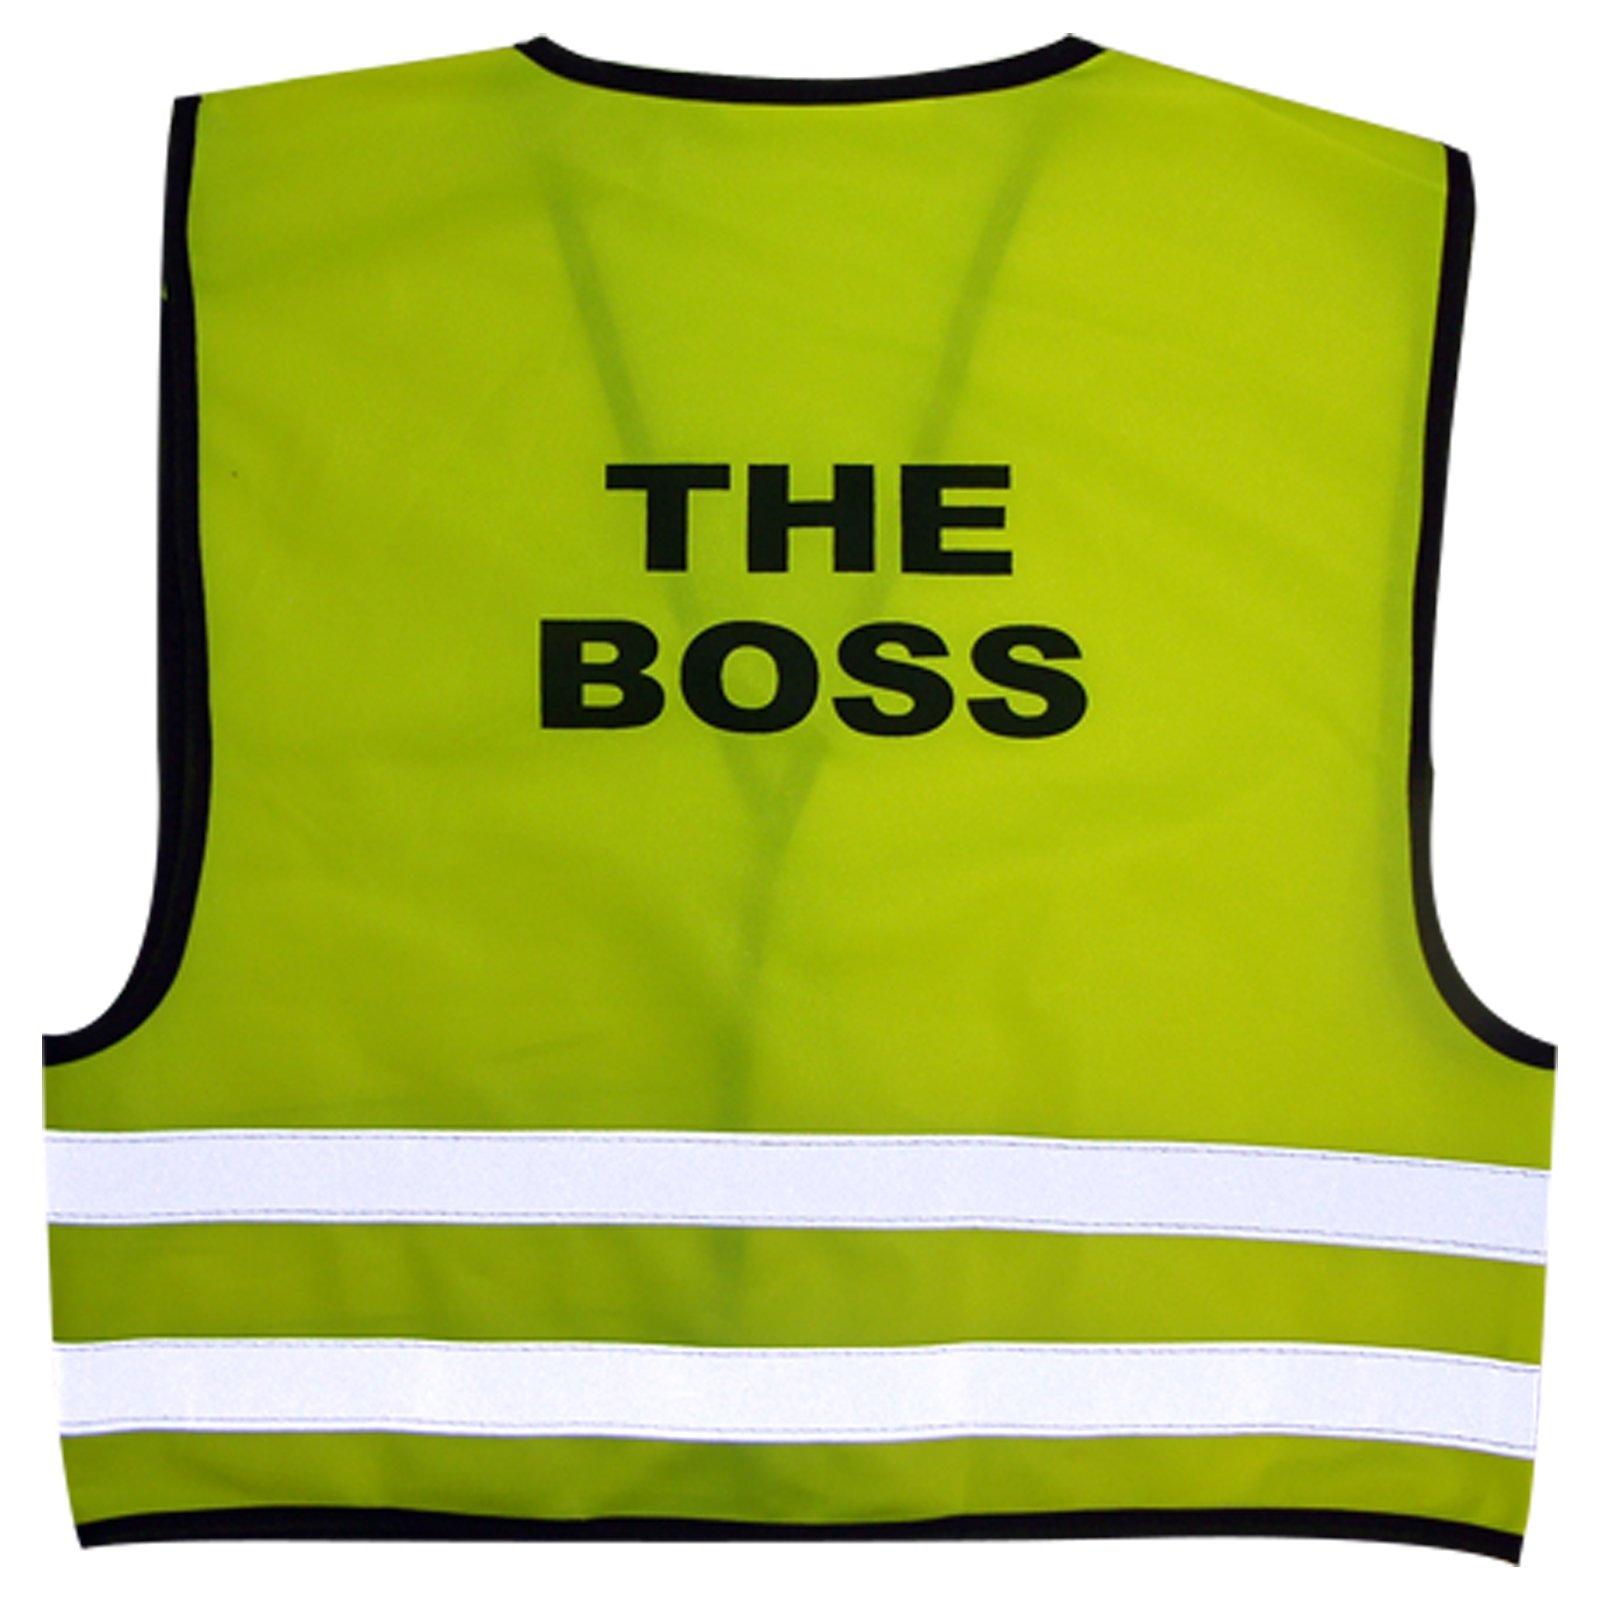 Trainee Builder Yellow Kids Childrens Boys Girls Hi-Vis Visibility Safety Vest